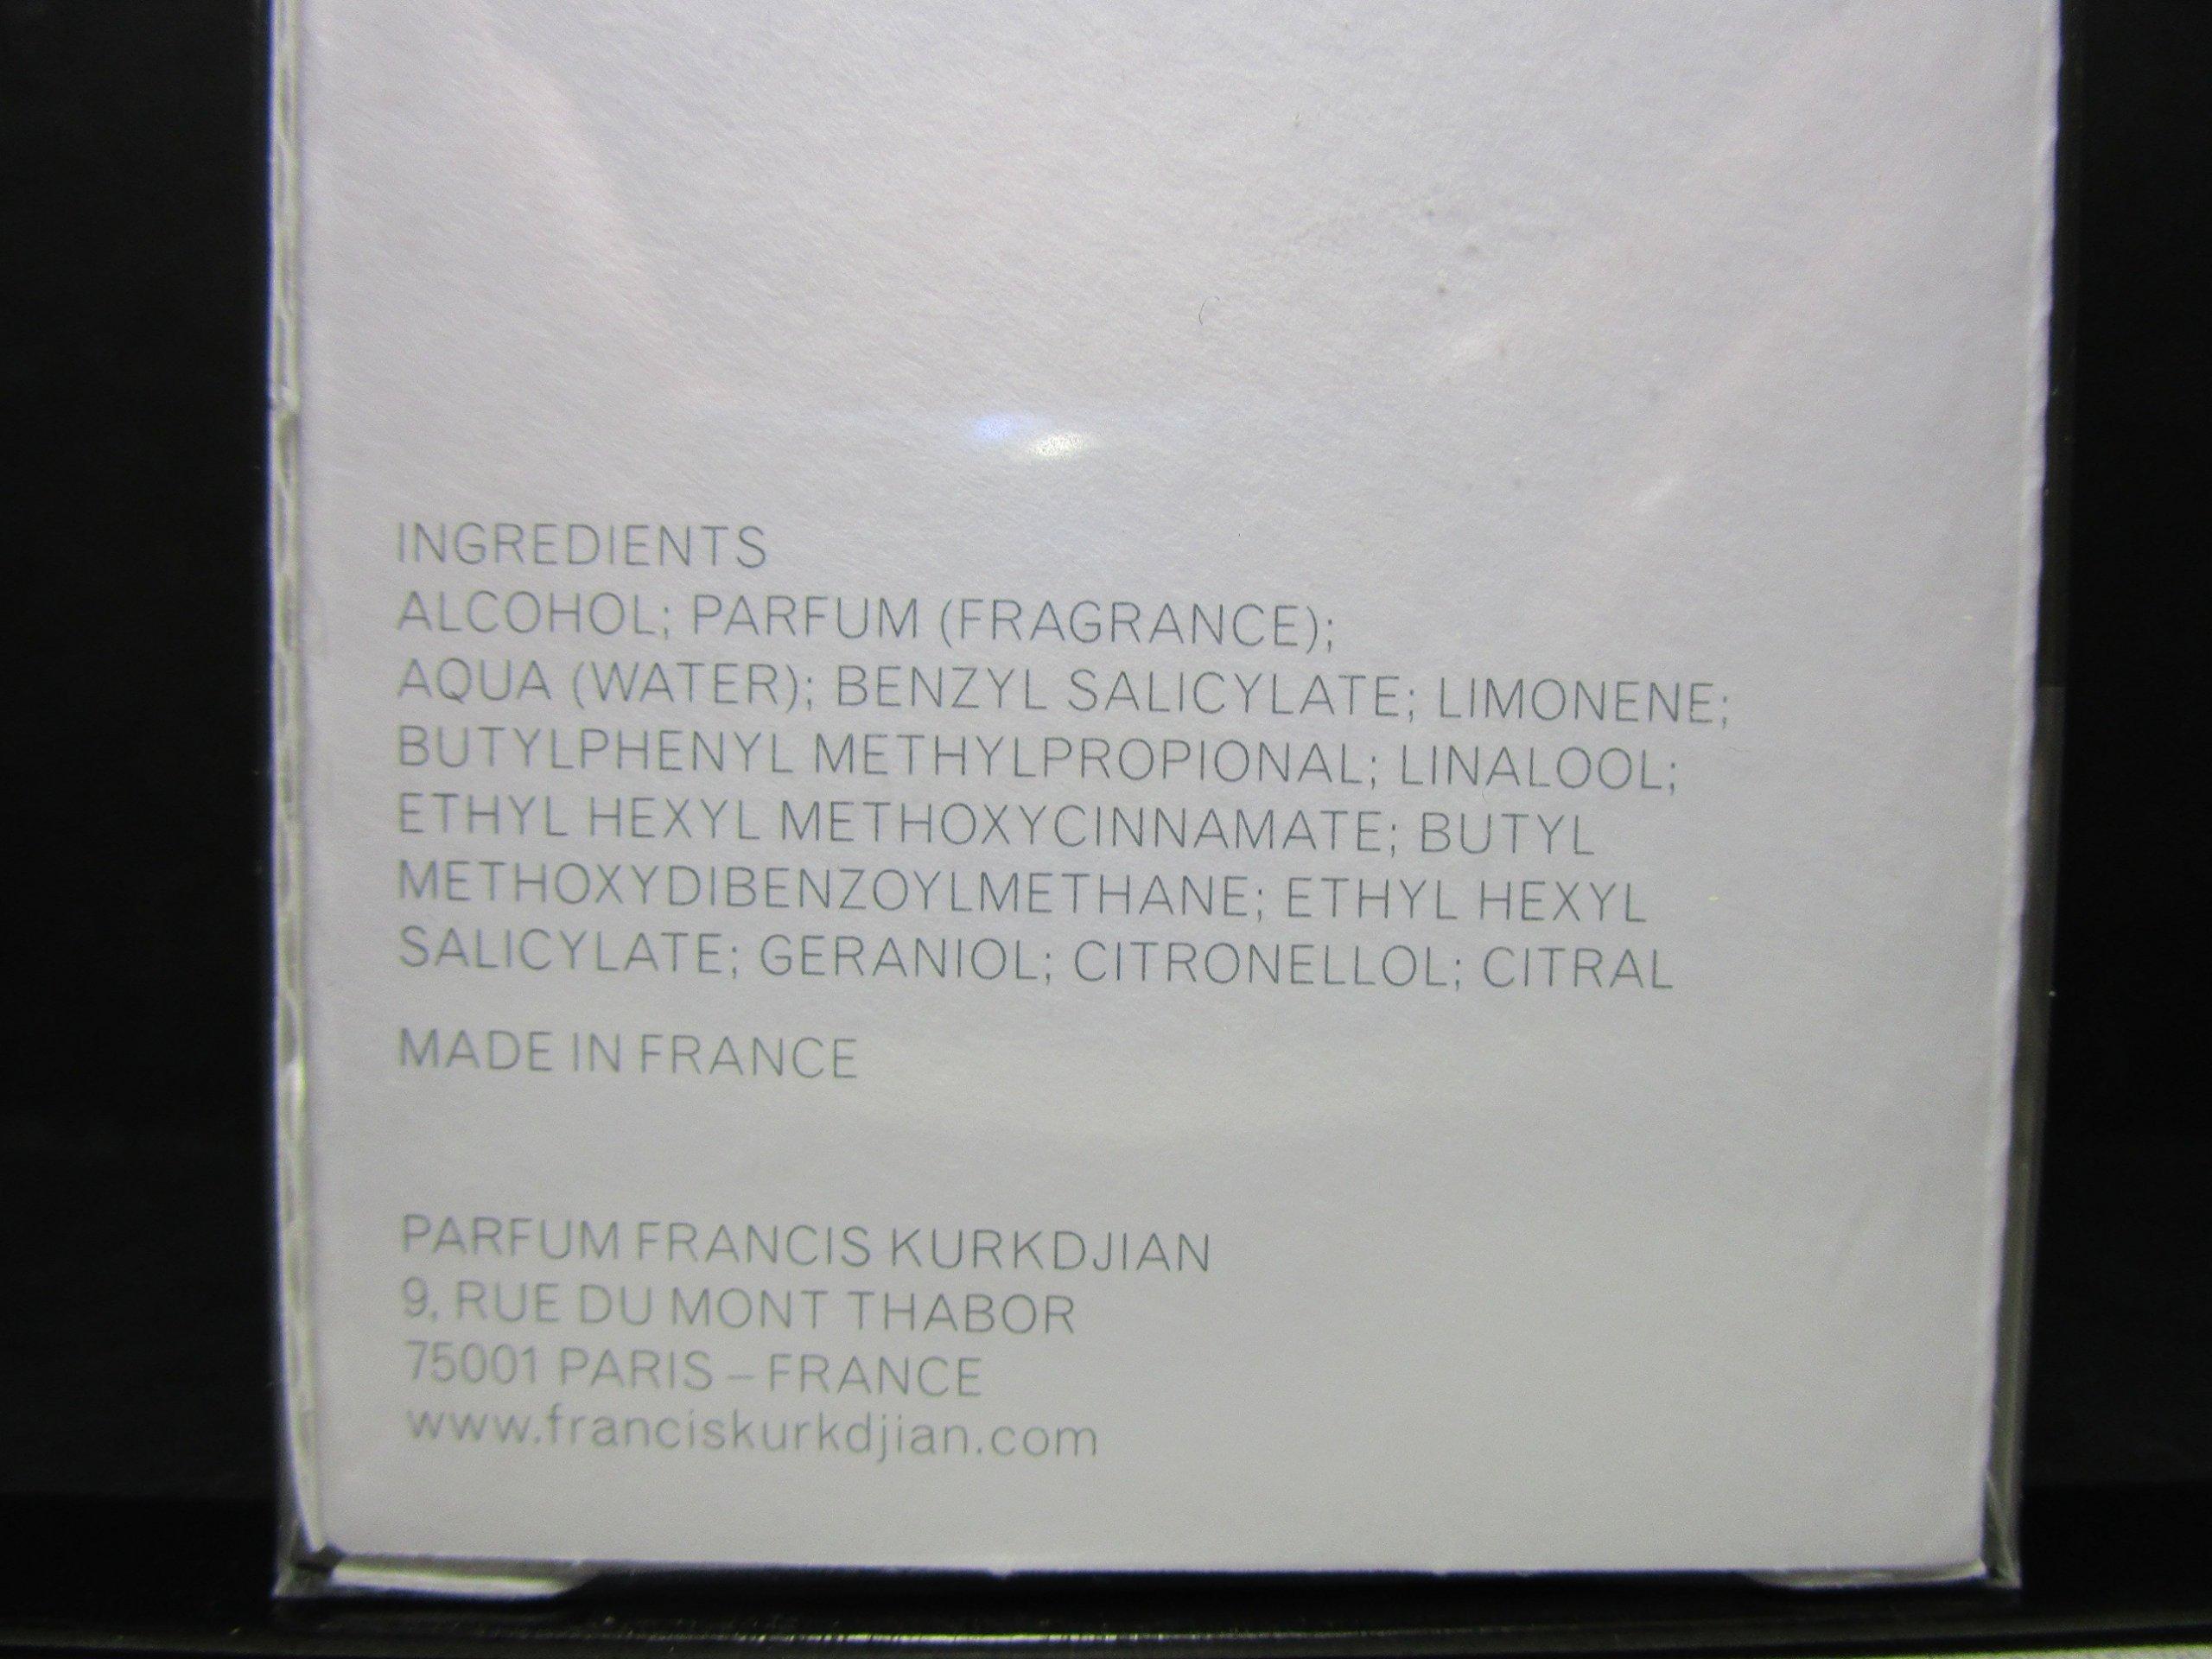 Maison Francis Kurkdjian Aqua Universalis Spray, 6.8 Ounce by Maison Francis Kurkdjian (Image #3)